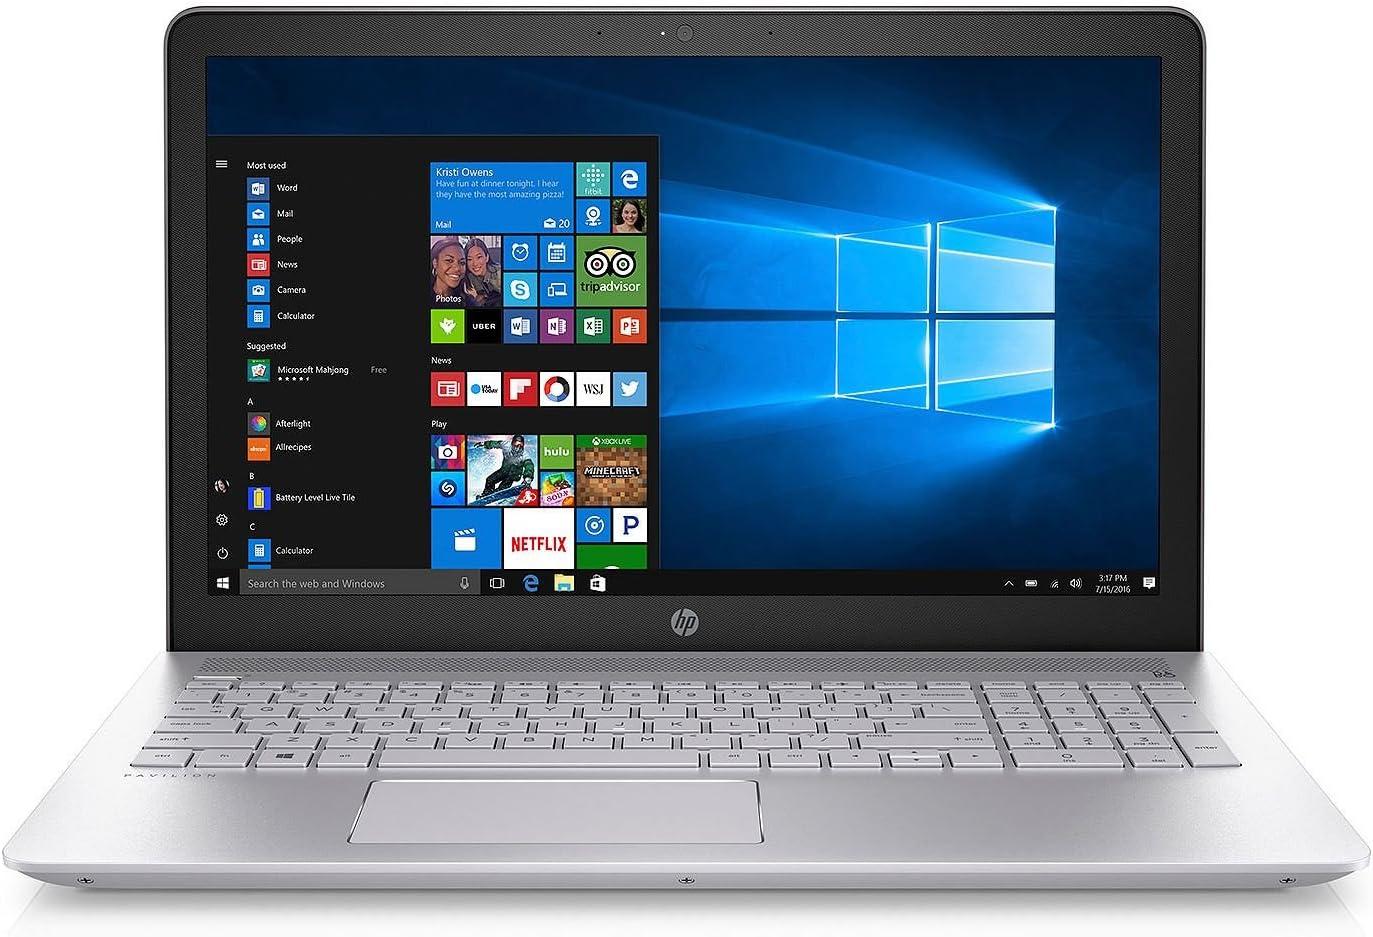 "HP Pavilion 15.6"" Full HD Notebook, Intel 8th Gen Core i7-8550U QC Processor, 8GB Memory, 2TB Hard Drive, 4GB NVIDIA GT940MX Graphics, Optical Drive, HD Webcam, Backlit Keyboard"